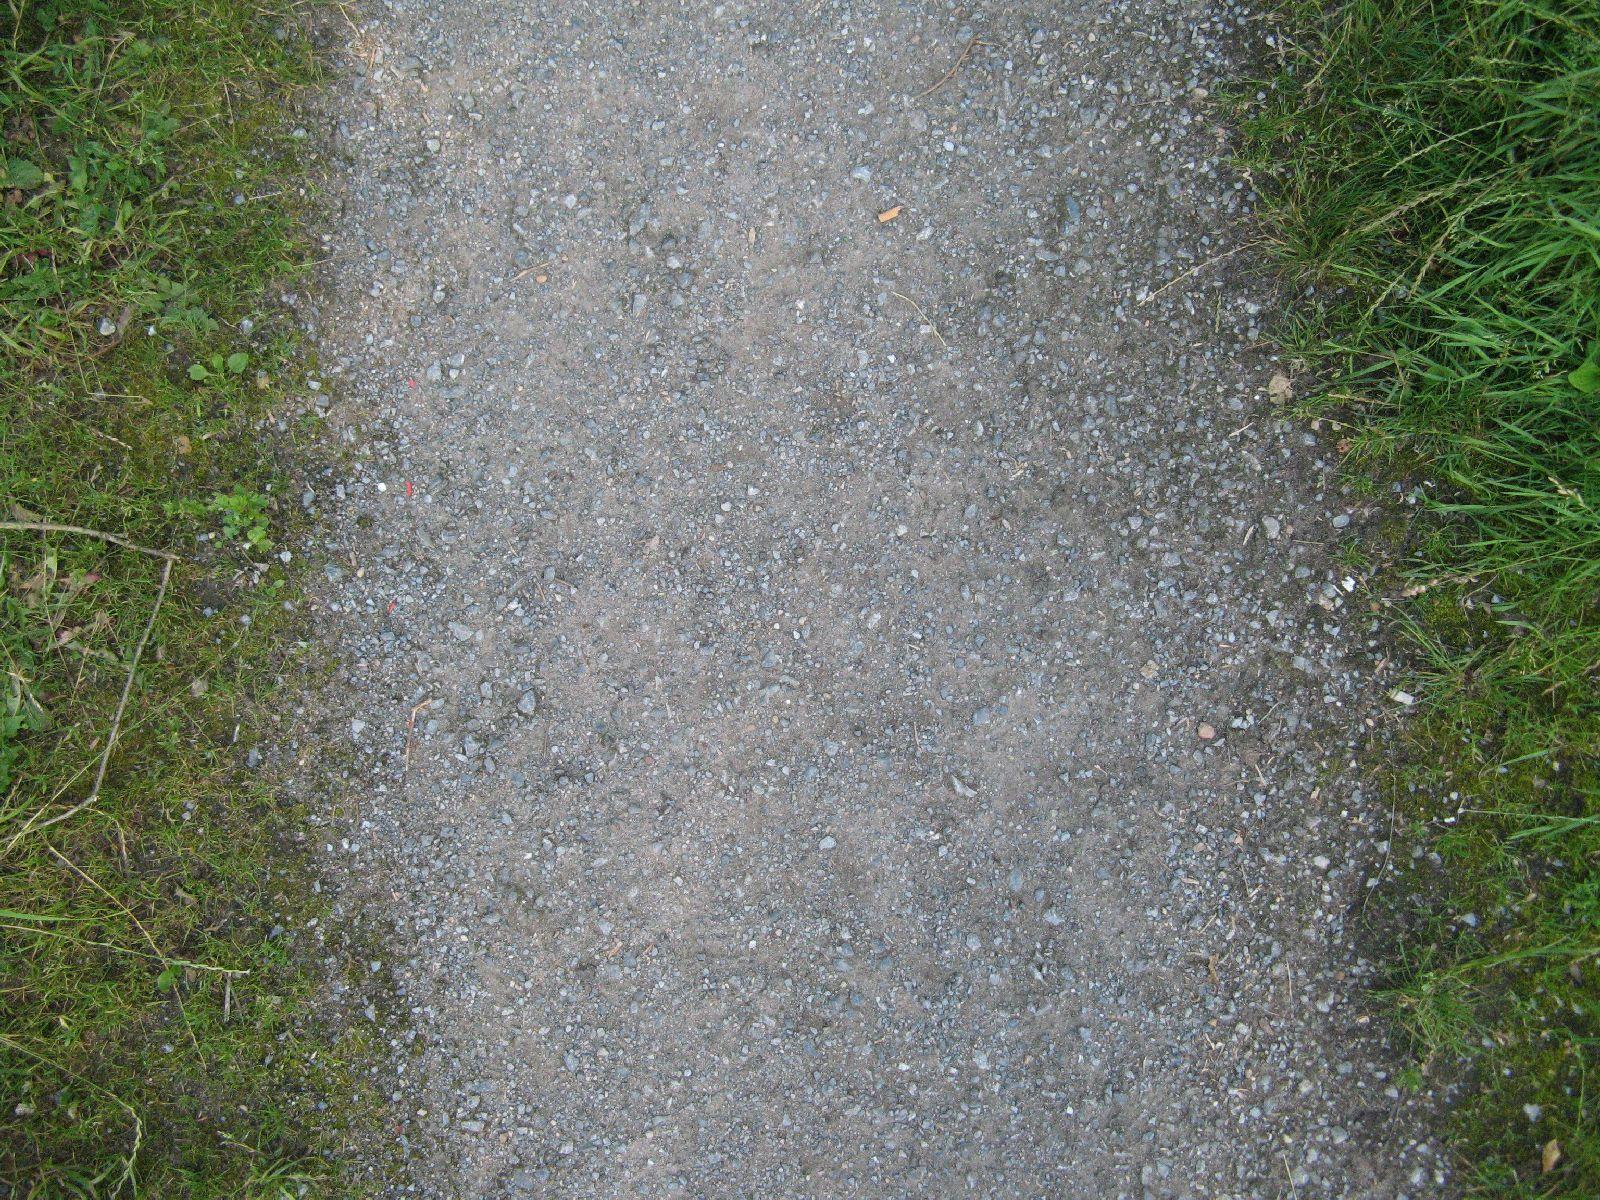 Boden-Gras-Moos-Blumen_Textur_B_00903